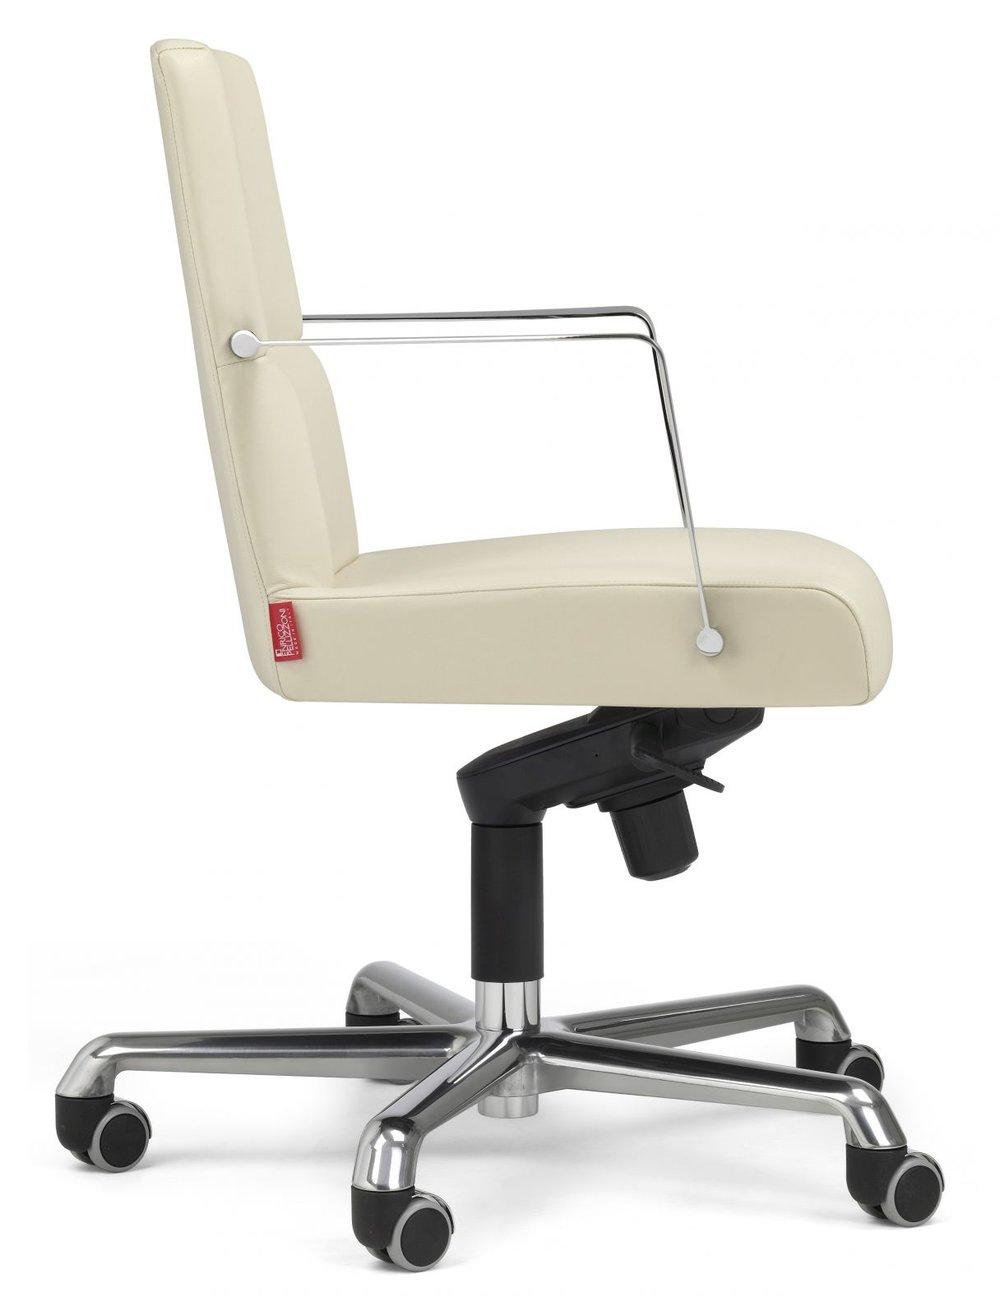 modern-office-chairs-Italian-furniture-designer-chairs (22).jpg